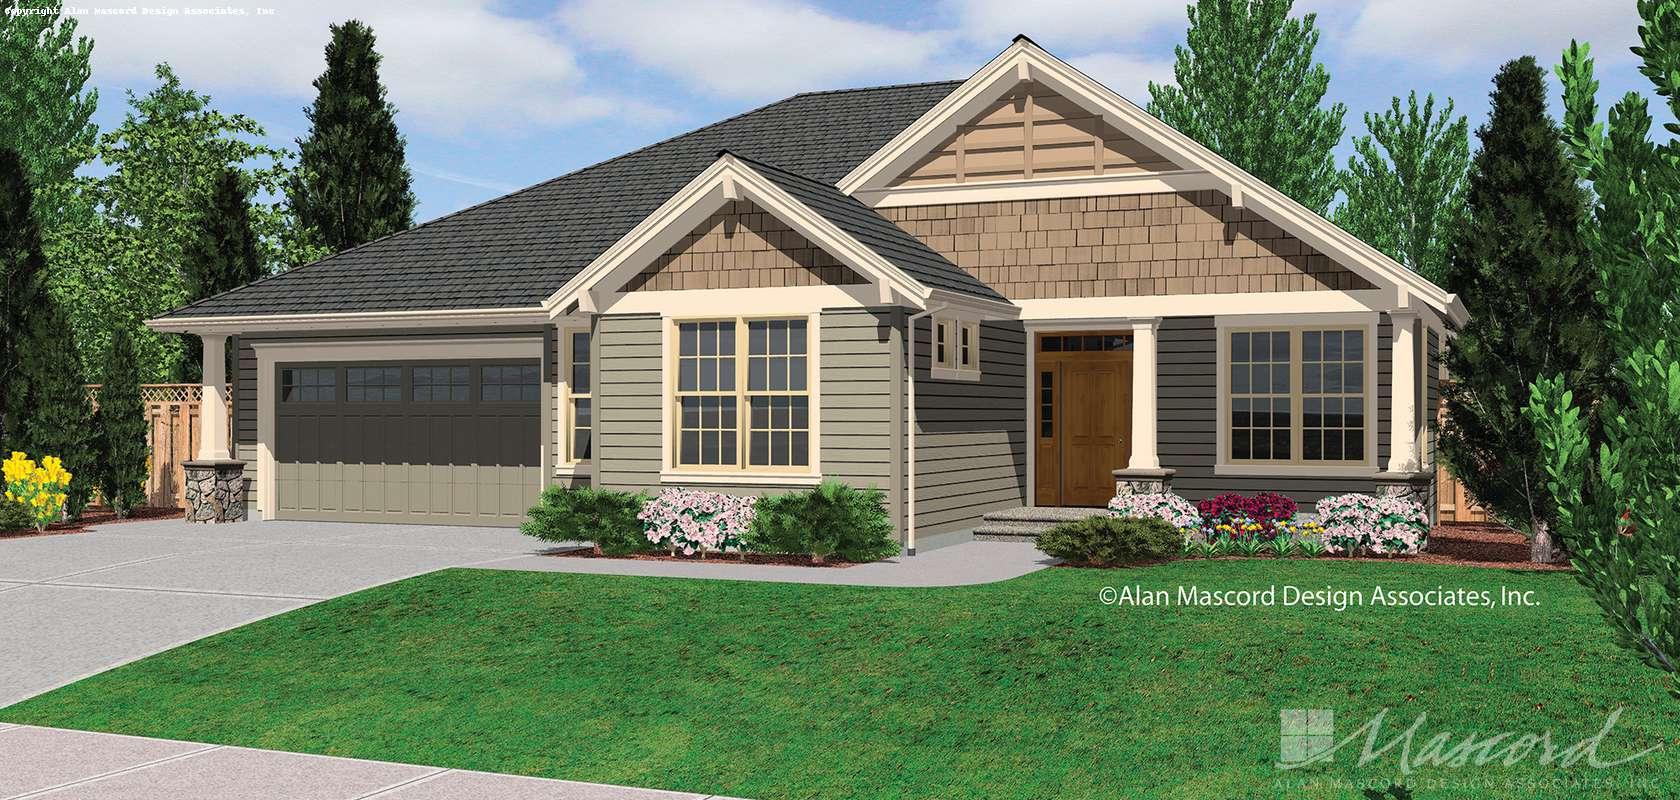 Mascord House Plan 1231FA: The Sutton